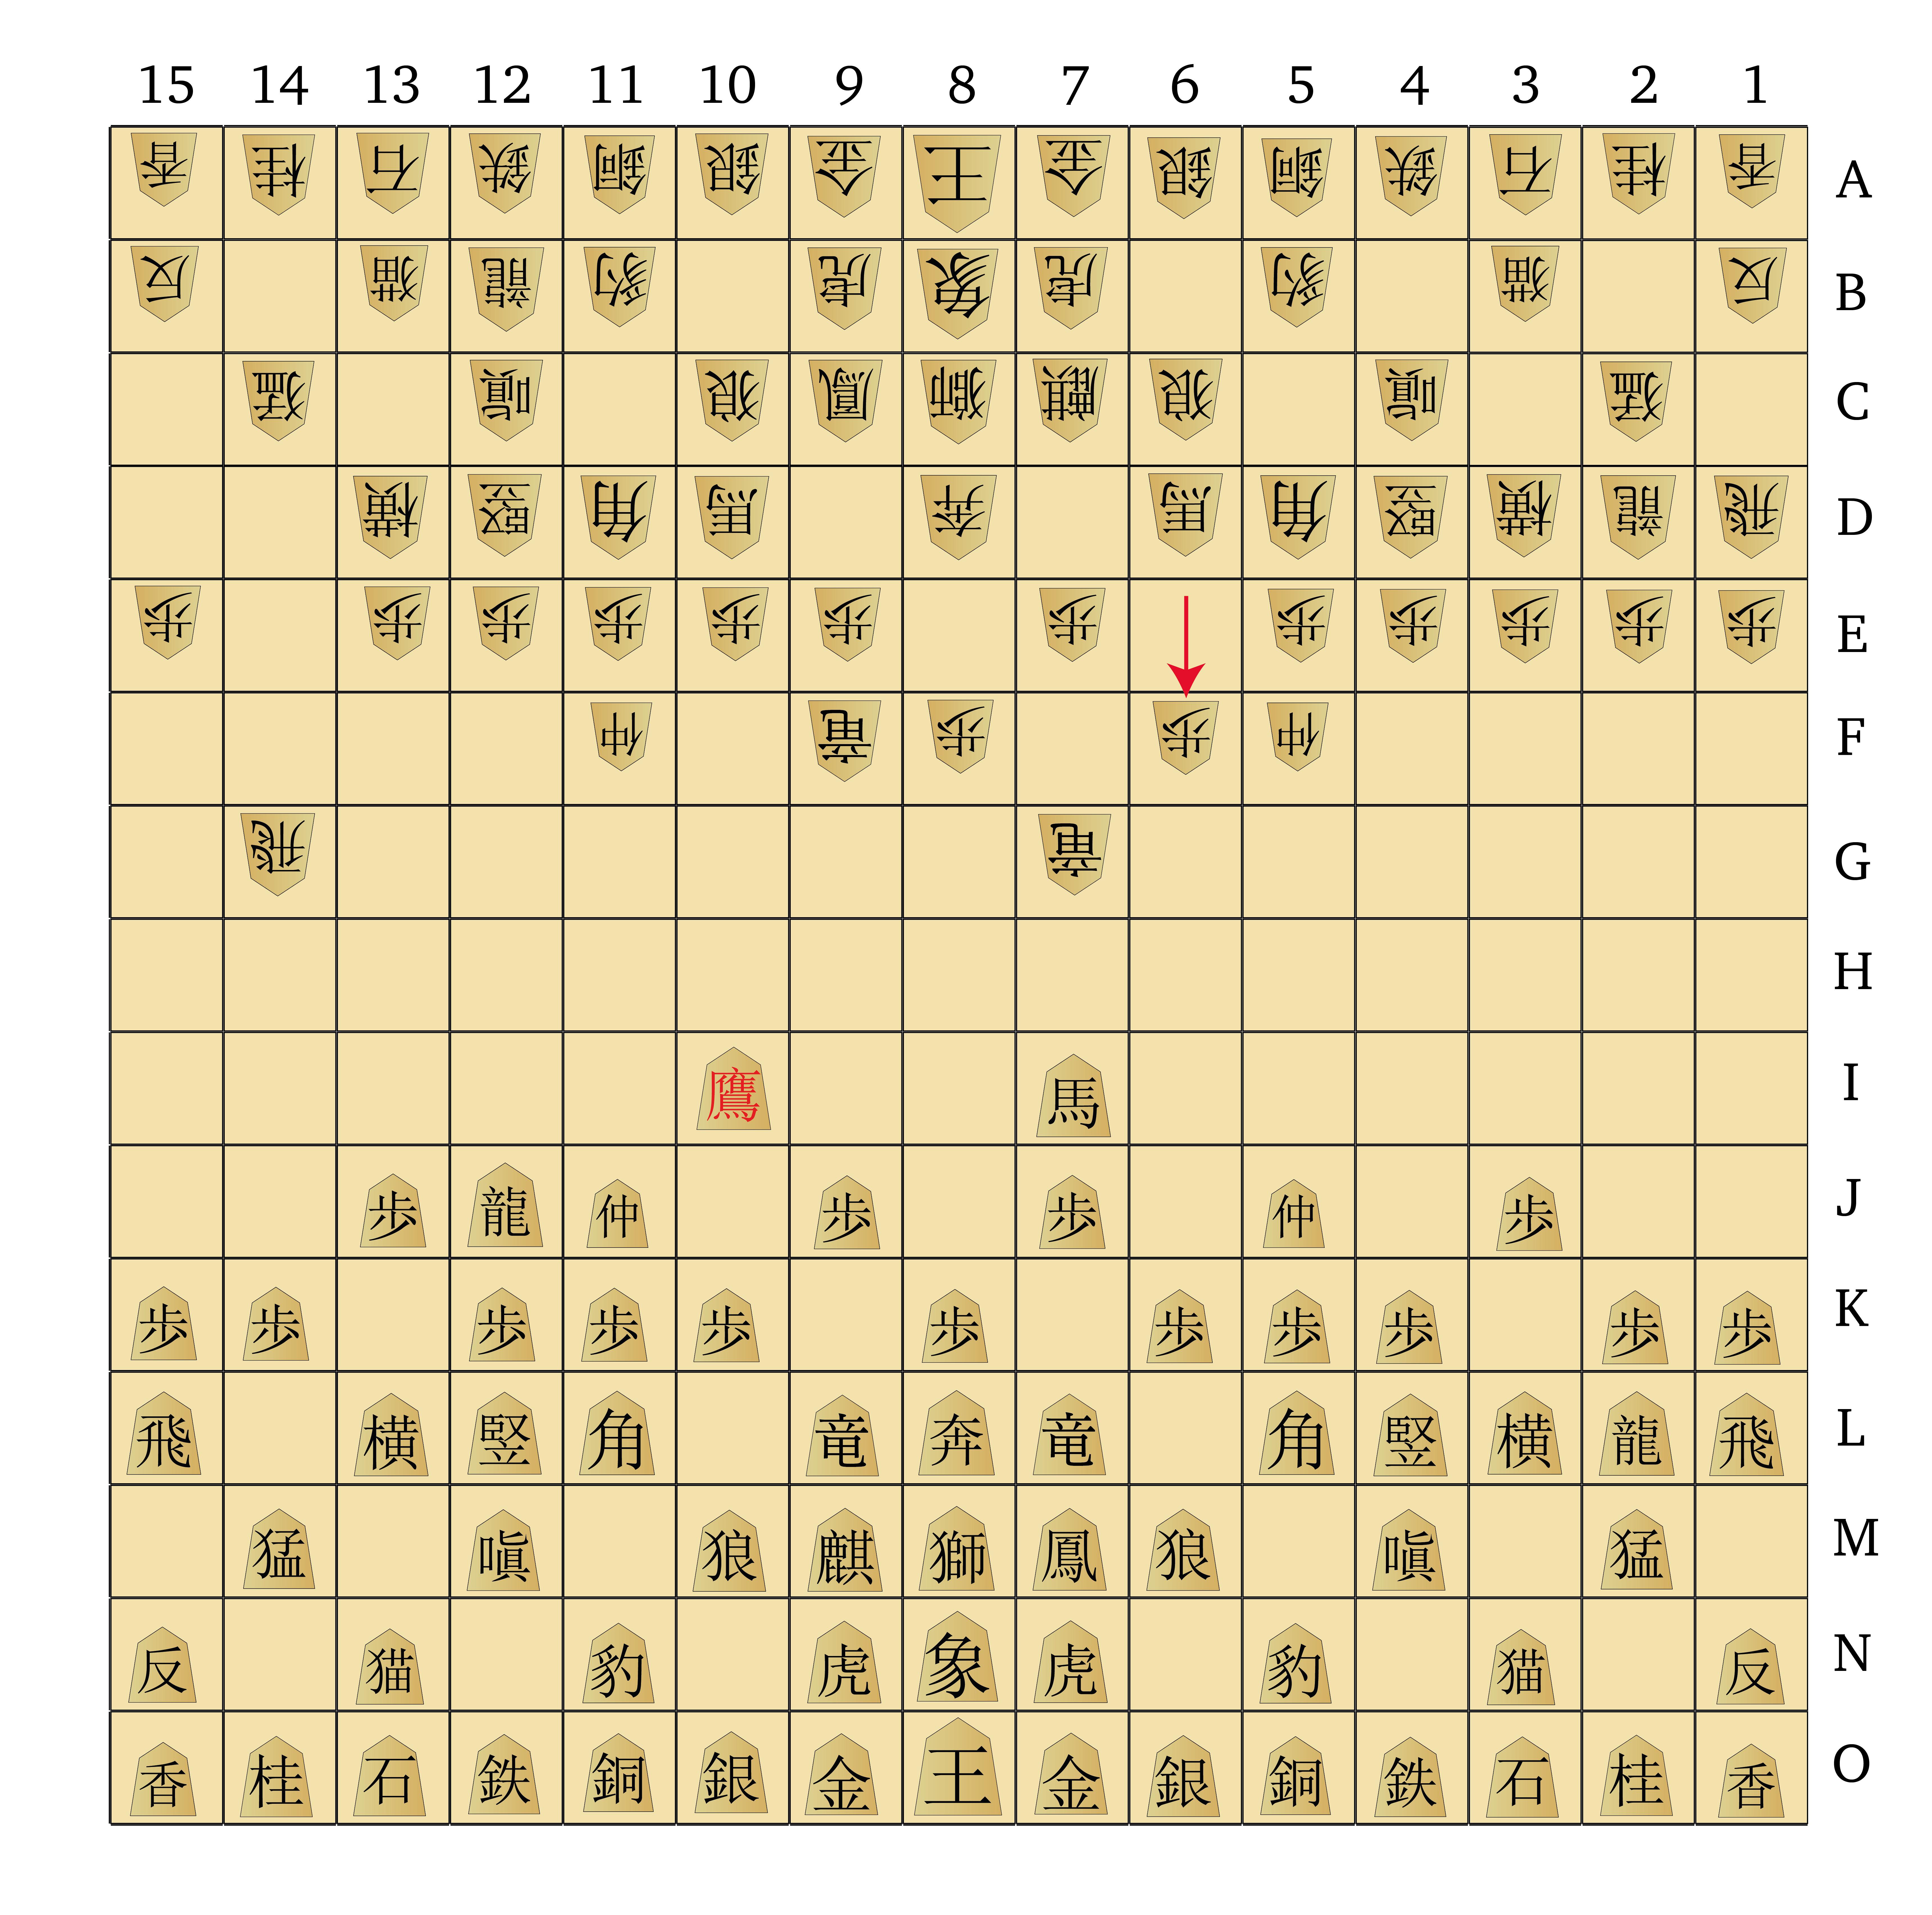 Dai Shogi 420 -- Move 20-01